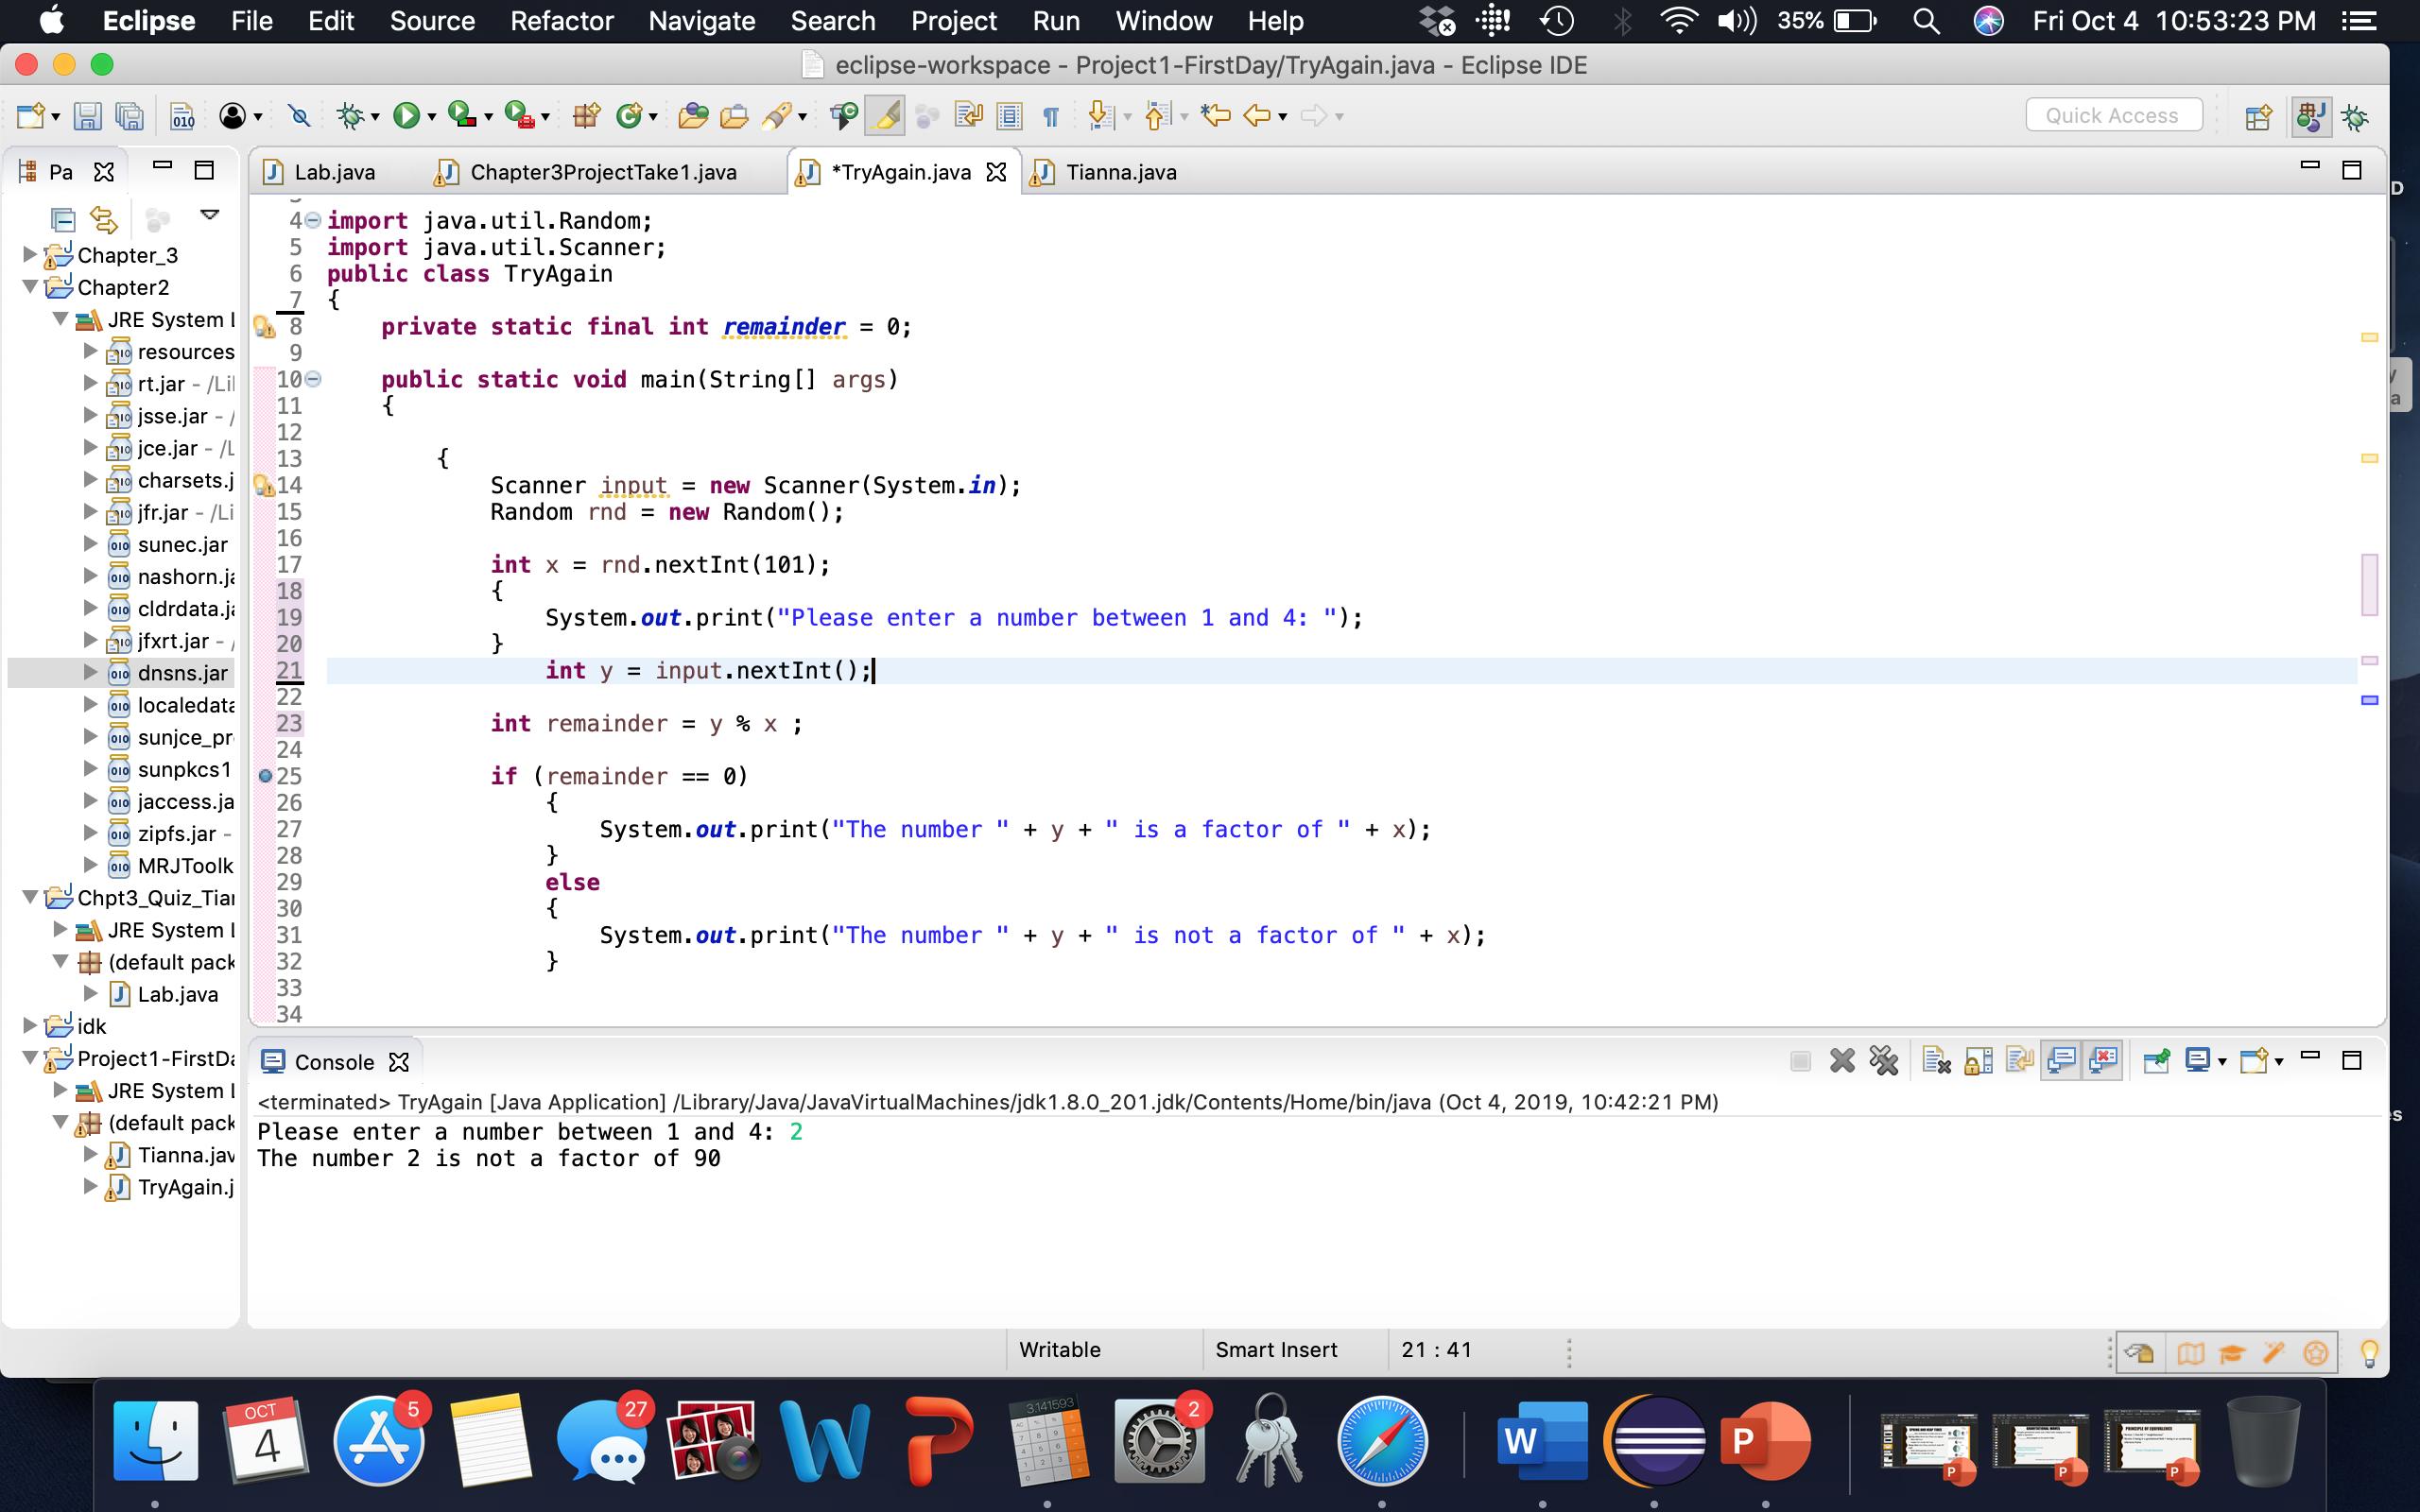 "Refactor Navigate Search Project Window Help Eclipse File Edit Source Fri Oct 4 10:53:23 PM Run 35% eclipse-workspace - Project1-FirstDay/TryAgain.java - Eclipse IDE Quick Acces 010 Ра X Lab.java Tianna.java Chapter3ProjectTake1.java *TryAgain.java 4 import java.util.Random; 5 import java.util.Scanner; 6 public class TryAgain Chapter_3 Chapter2 JRE System I private static final int remainder 8 0; = 9 EI resources public static void main(String[] args) { 10e 11 19 rt.jar - /Lil jsse.jar - 12 jce.jar /L I9charsets.j 13 = new Scanner(System.in); = new Random(); Scanner input Random rnd 14 15 16 jfr.jar - /Li sunec.jar O10 rnd.nextInt 101) int x = { System.out.print(""Please enter a number between 1 and 4: ""); } int y 17 nashorn.ja 18 010 cldrdata.ja 19 jfxrt.jar 20 Eו input.nextInt ( ) ;. 21 dnsns.jar O10 22 010 localedata int remainder 23 у % х; sunjce_pr 24 sunpkcs1 if (remainder { System.out.print(""The number 0) O10 o25 26 jaccess.ja O10 y "" is a factor of х); 27 + zipfs.jar O10 28 MRJToolk else 29 Chpt3_Quiz_Tiai { System.out.print(""The number } 30 JRE System l х)%; y "" is not a factor of 31 (default pack 32 33 J Lab.java 34 idk Project1-First D ConsoleX JRE System terminated> TryAgain [Java Application] /Library/Java/JavaVirtualMachines/jdk1.8.0_201.jdk/Contents/Home/bin/java (Oct 4, 2019, 10:42:21 PM) (default pack Please enter a number between 1 and 4: 2 Tianna.jav The number 2 is not a factor of 90 TryAgain.j Writable Smart Insert 21 41 WP 5 27 2 3.141593 ОСТ W P 9 CD LO"